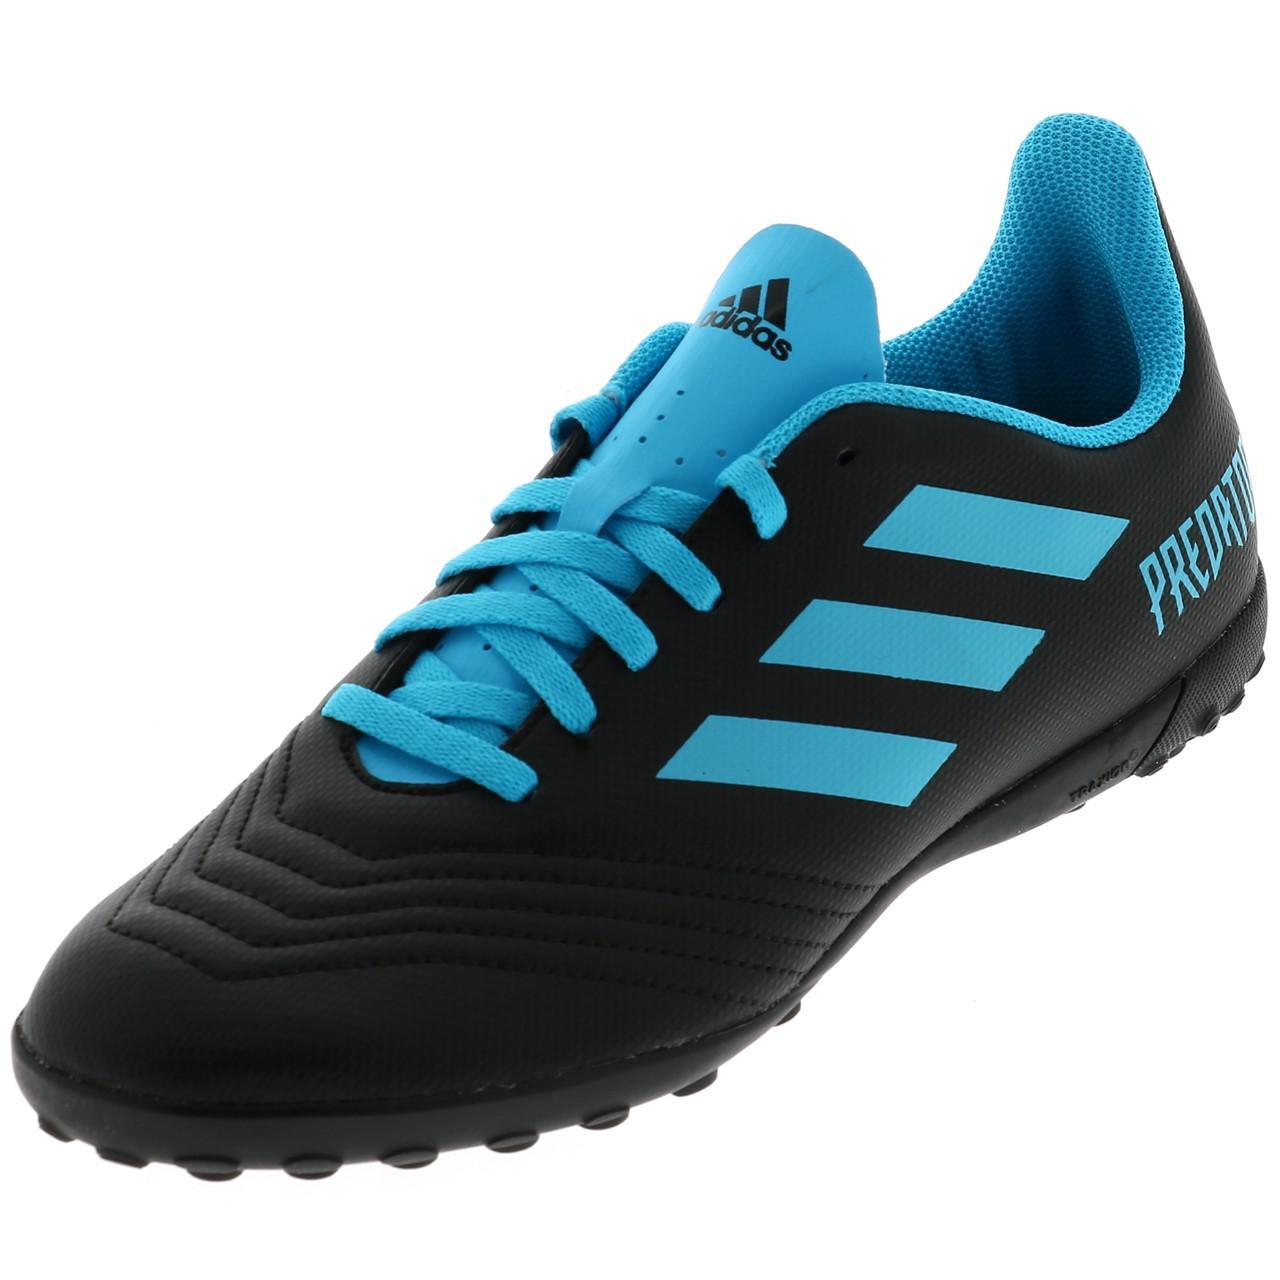 Football-Shoes-Stabilized-Adidas-Predator-19-4-Tf-Jmoule-Jr-Black-42177-N